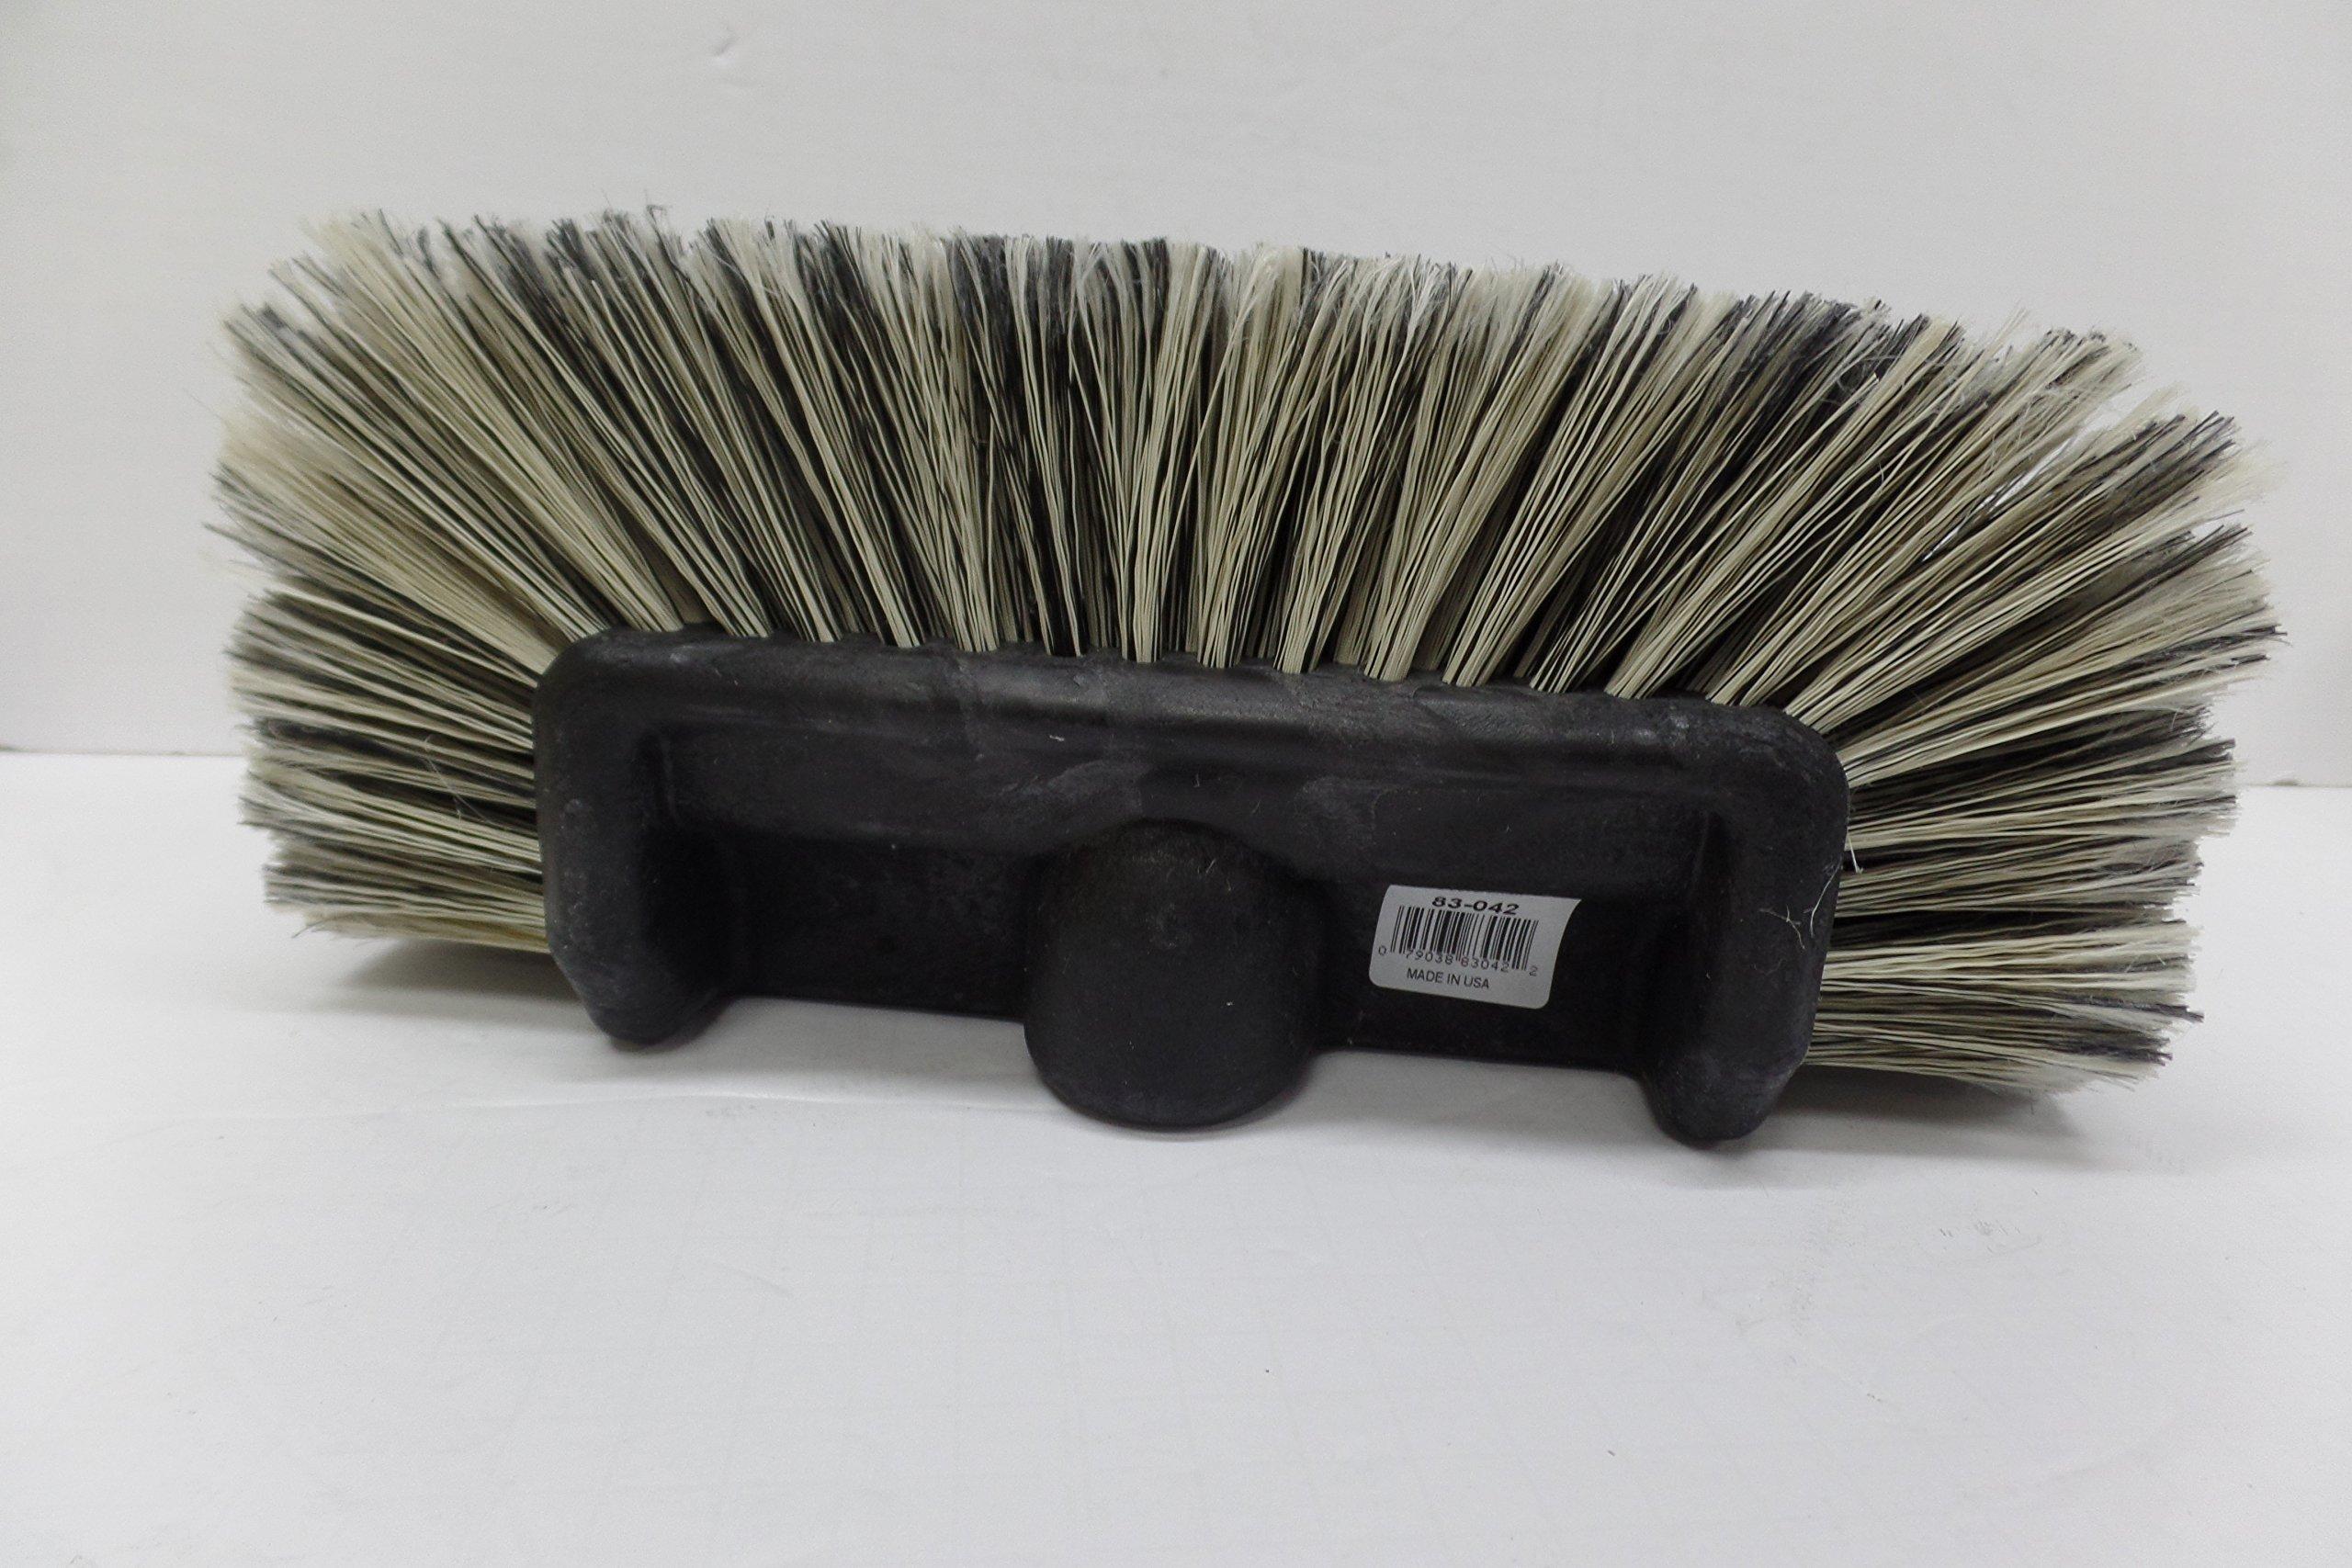 5 level soft bristle truck brush black